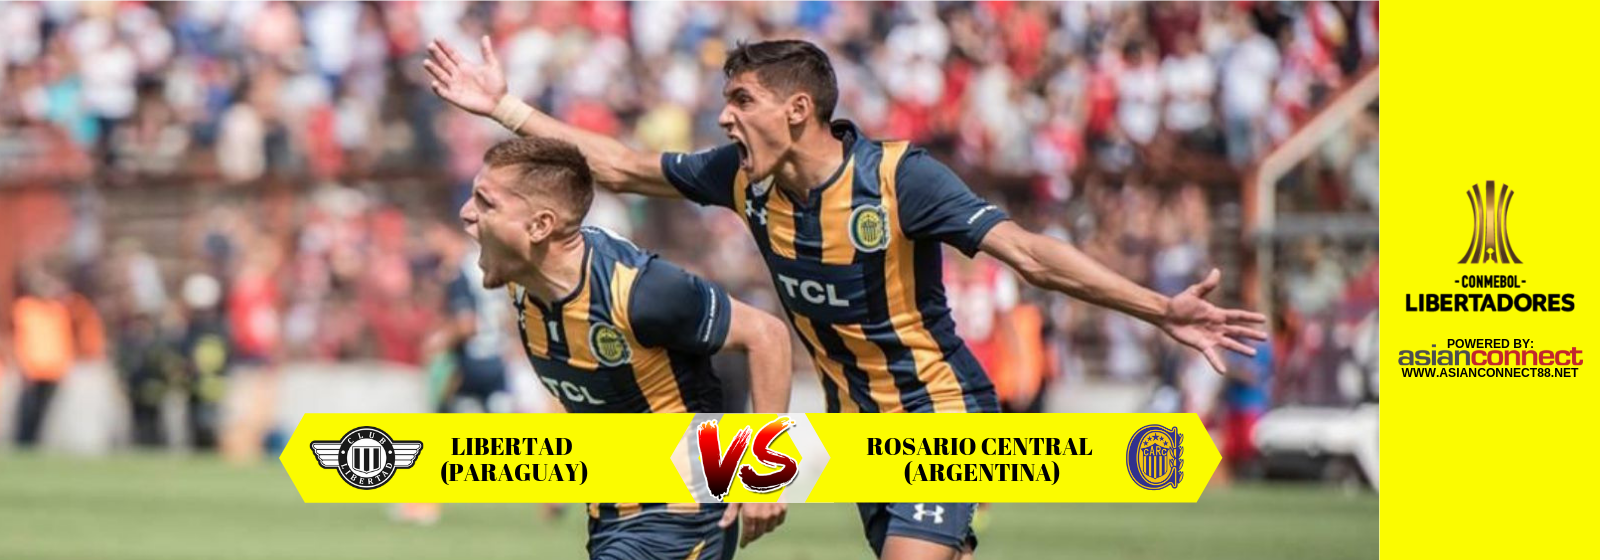 Libertad vs Rosario Central Odds   April 20, 20   Football Match ...